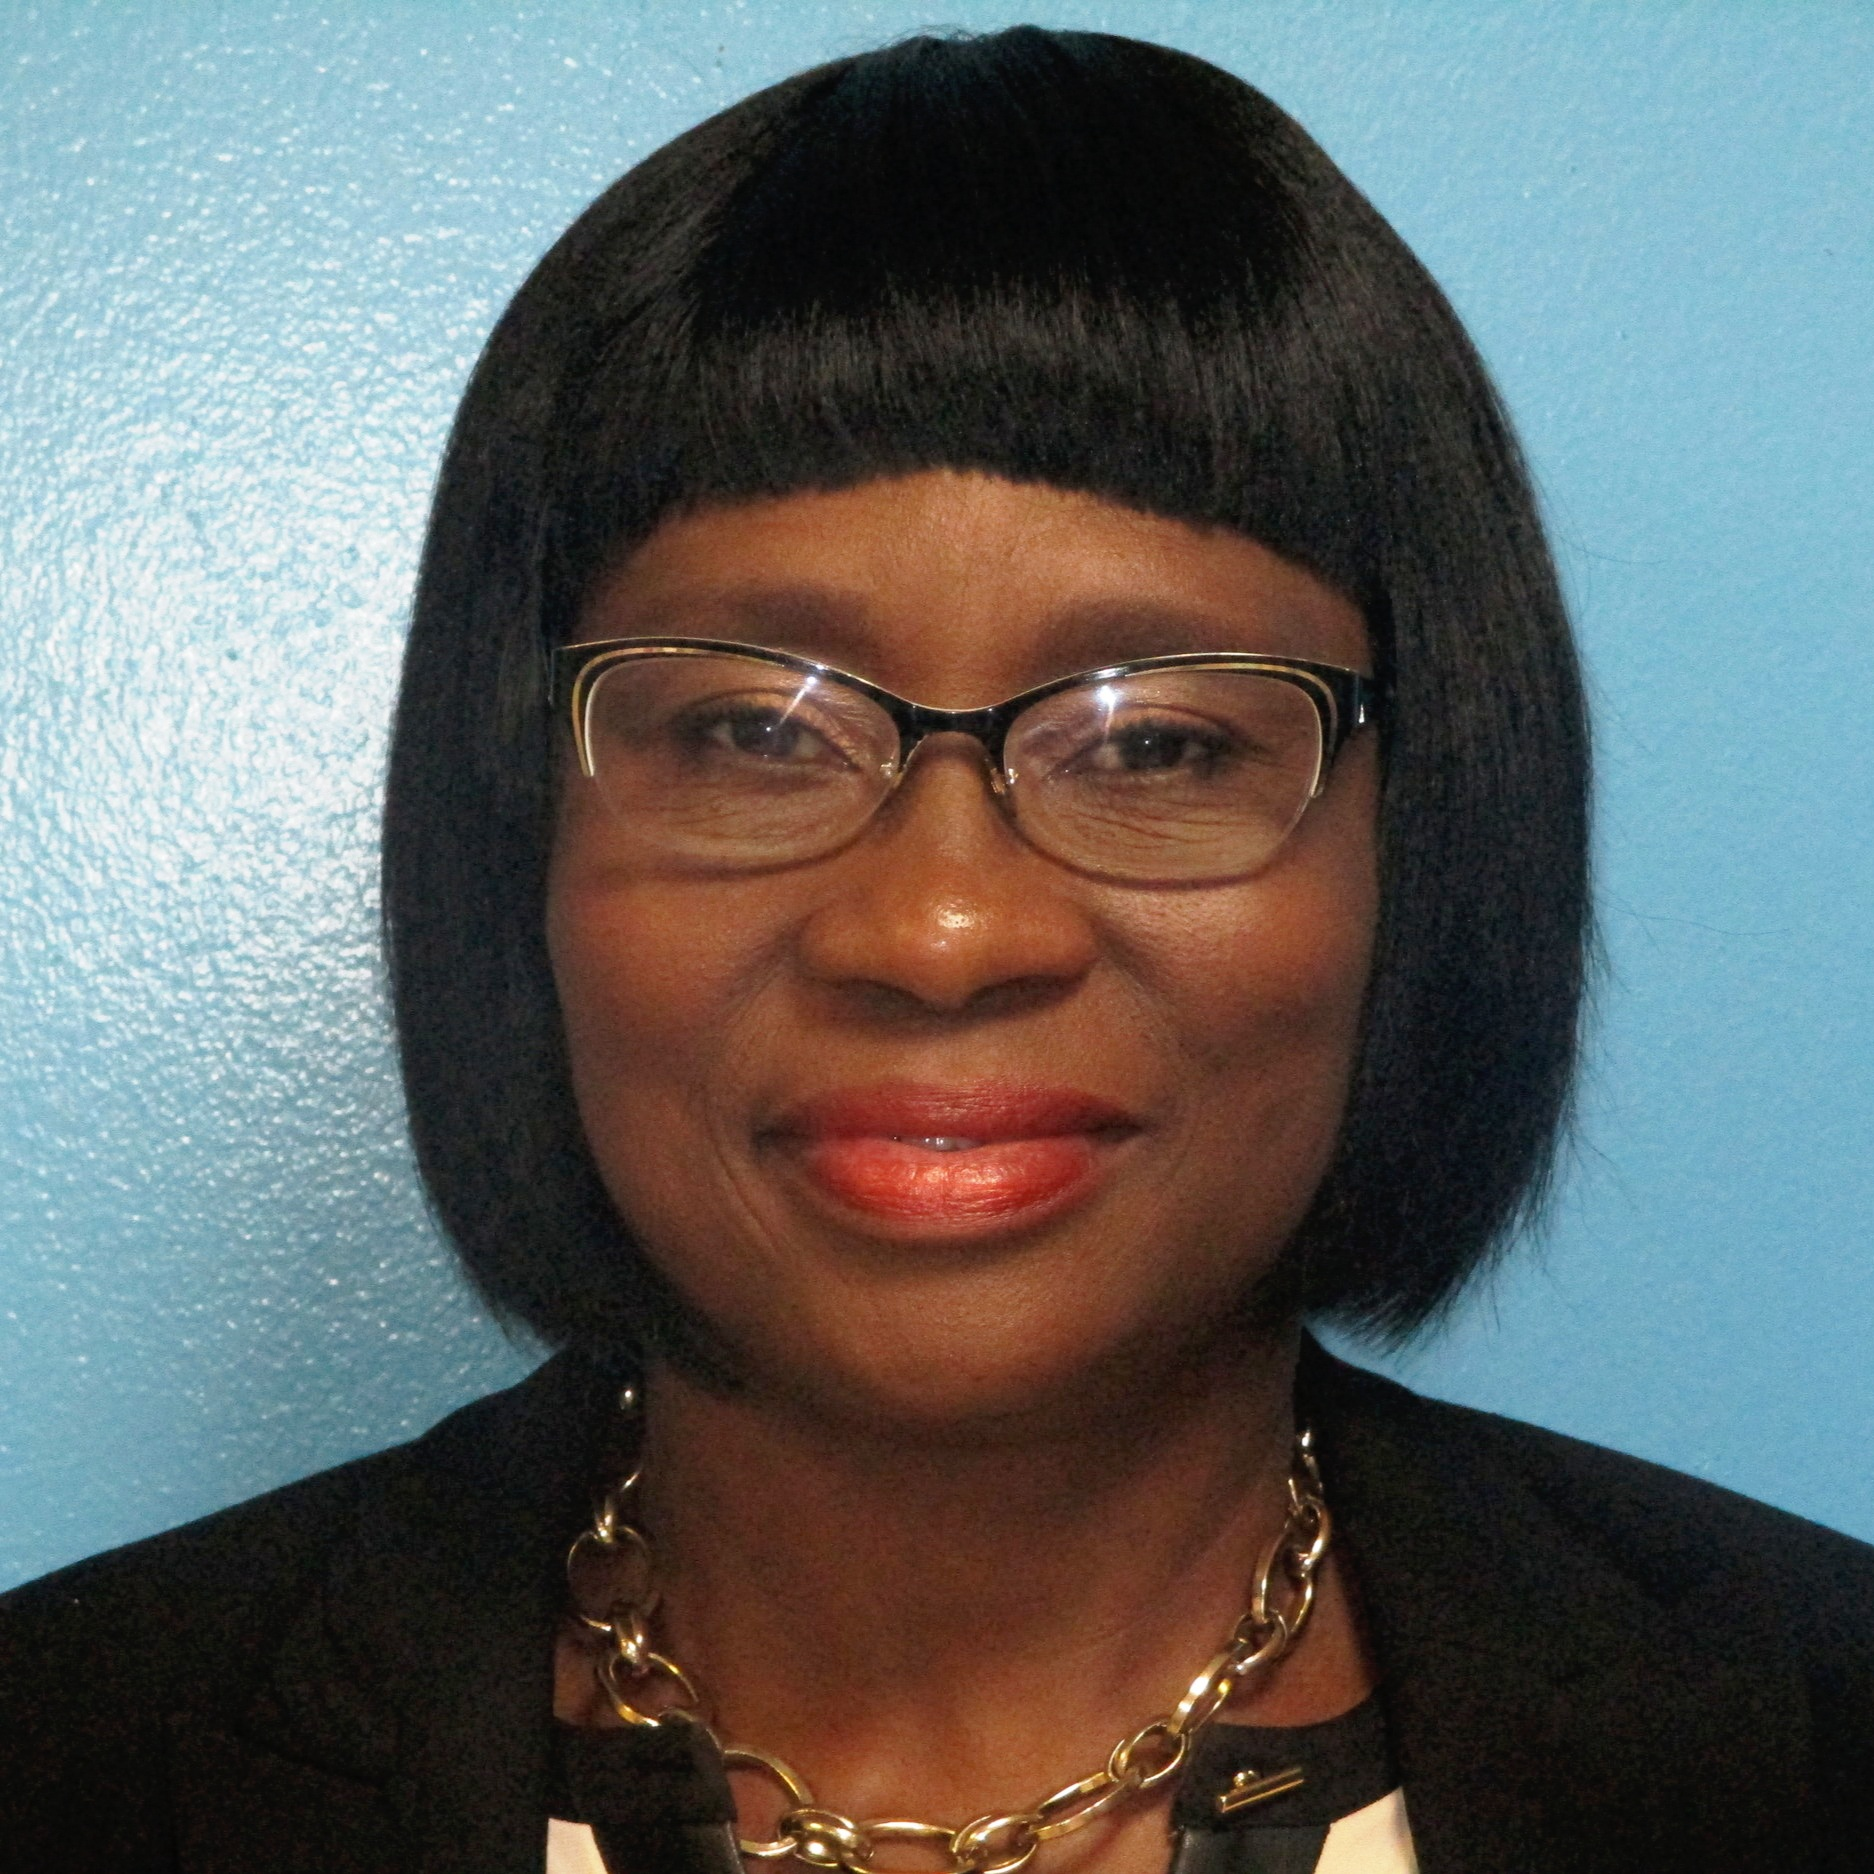 Nevlyn Nicholson - Director of Operations, Training & Development